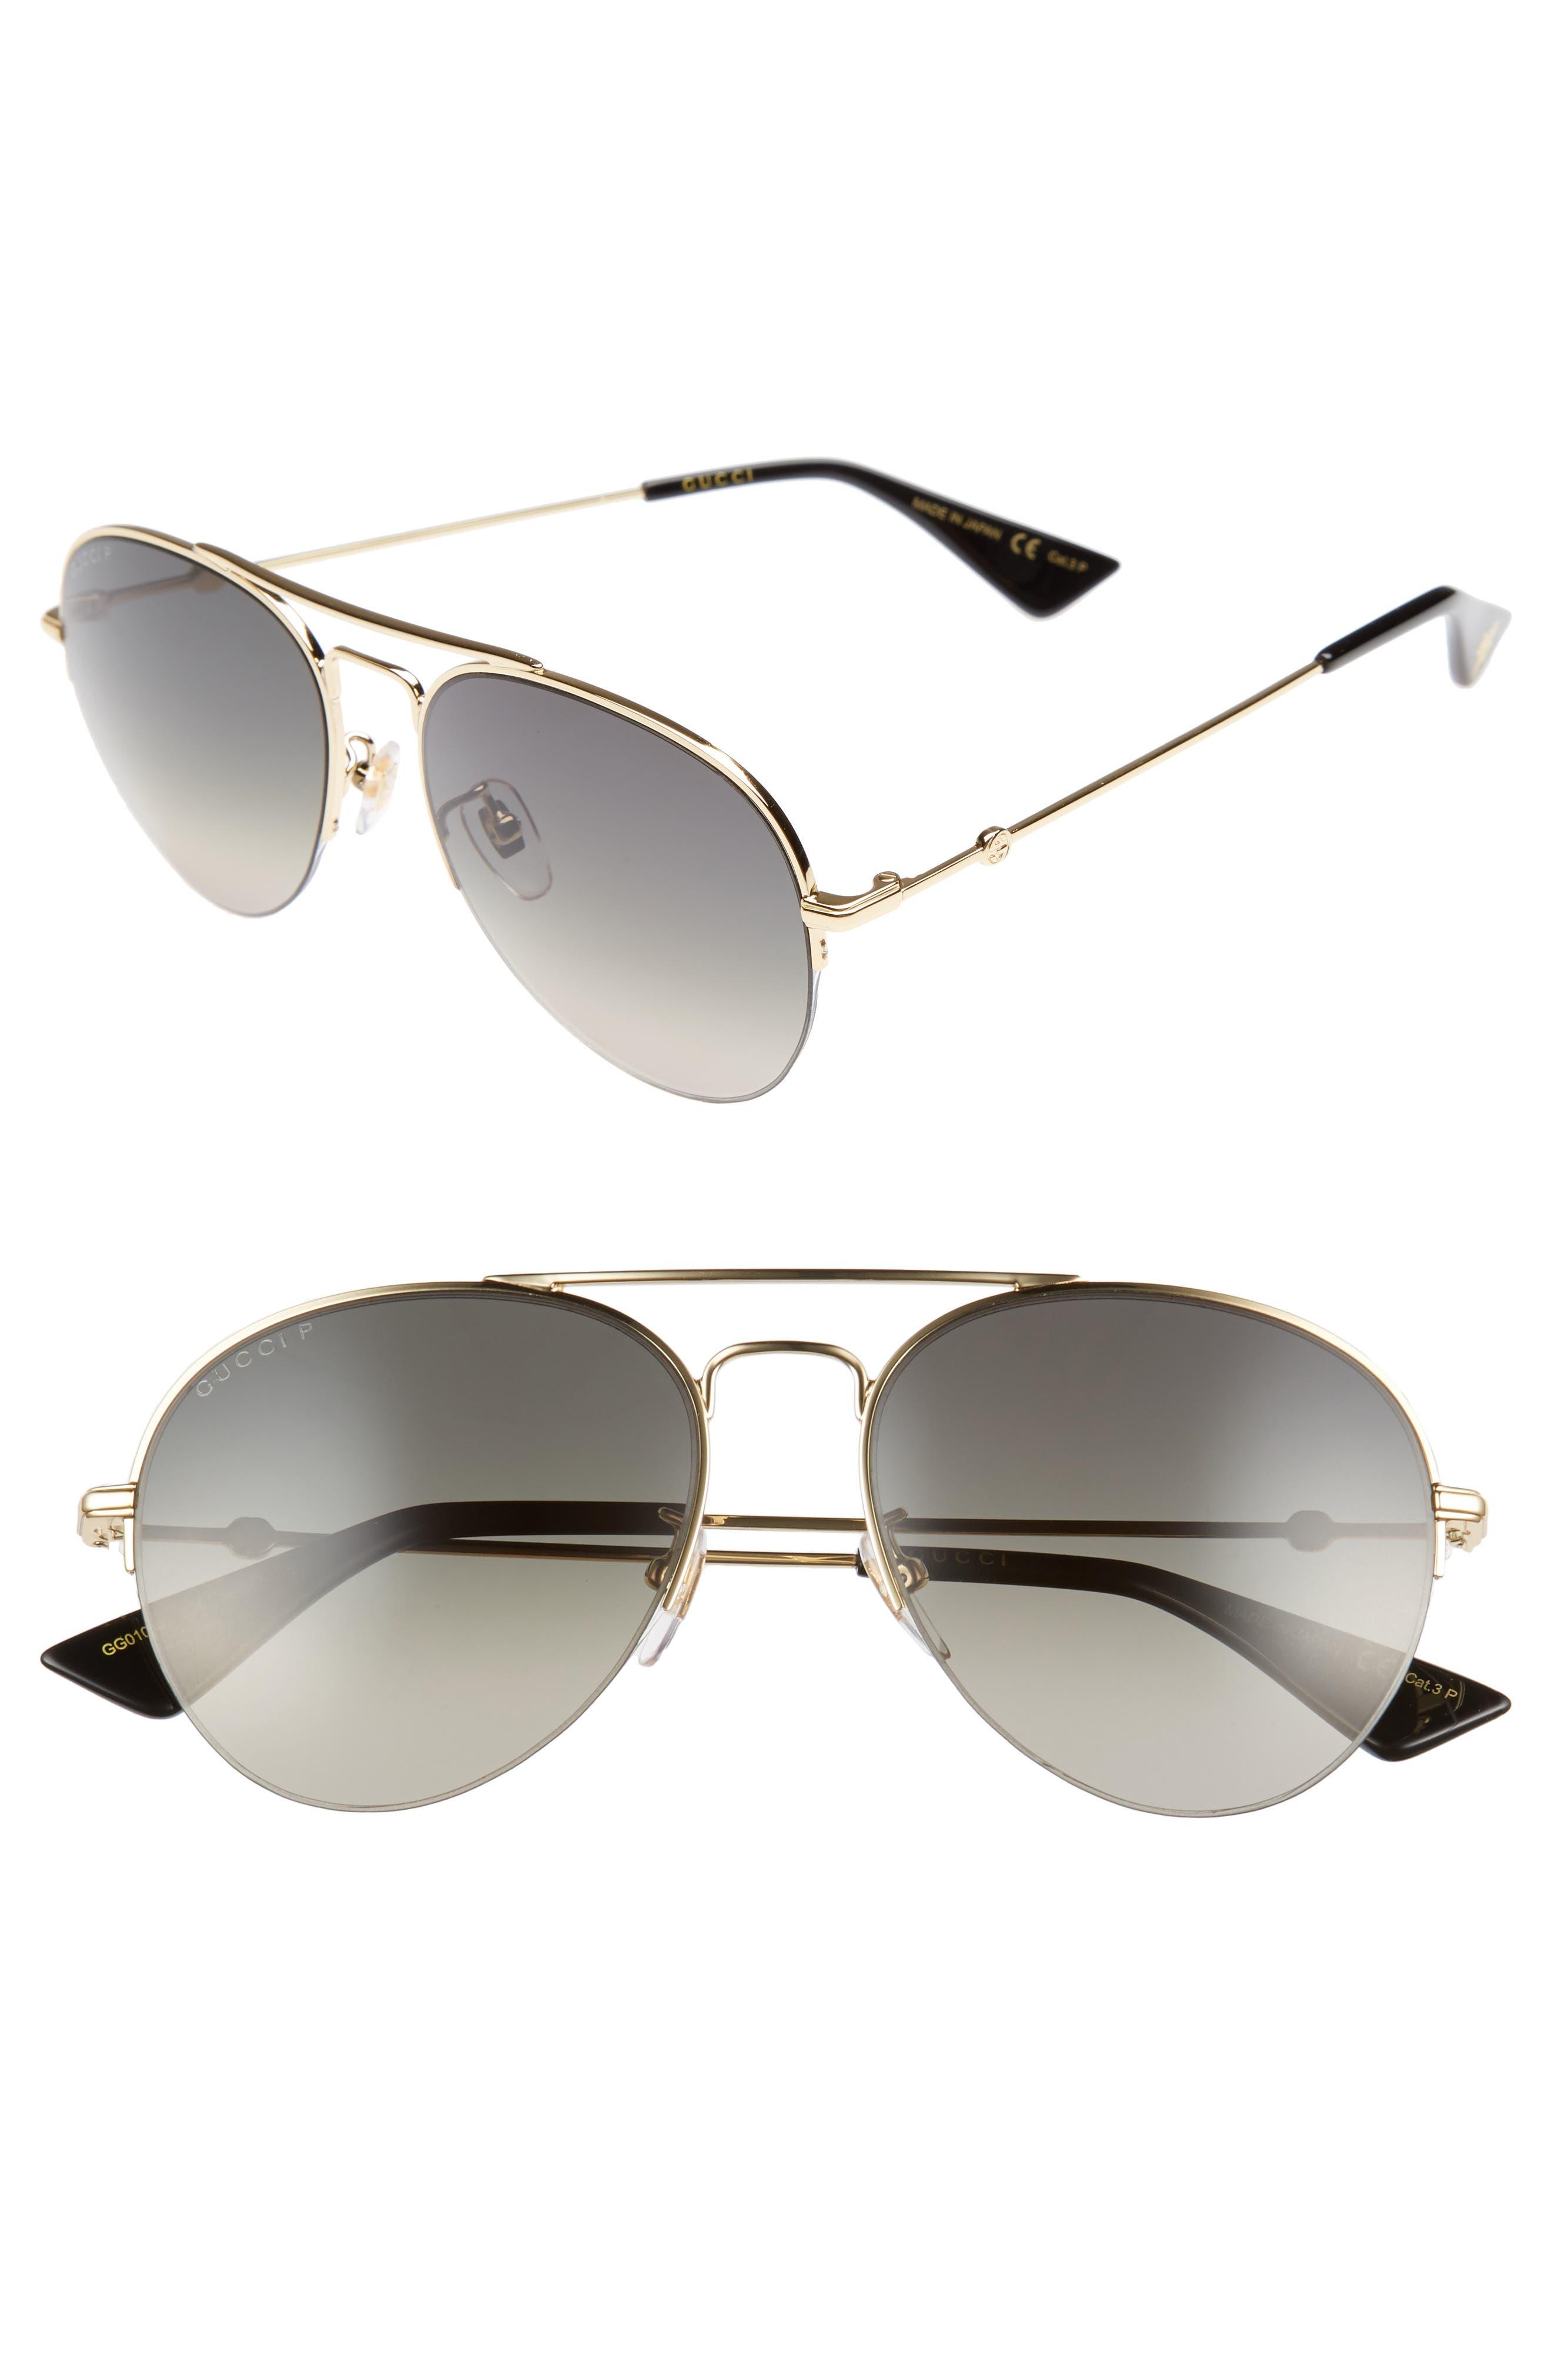 Alternate Image 1 Selected - Gucci Pilot 56mm Aviator Sunglasses